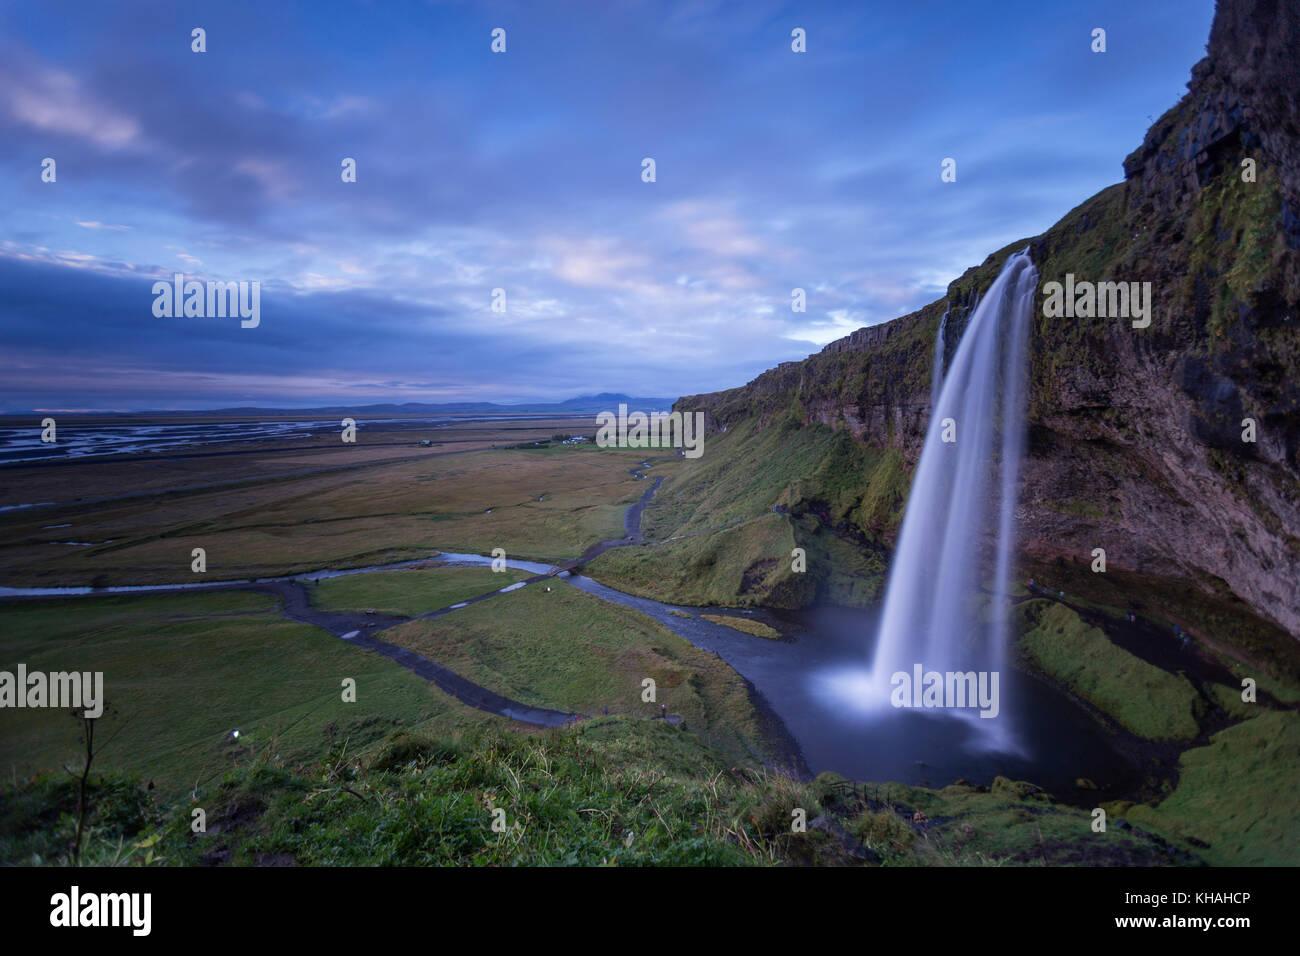 Der Wasserfall Seljalandsfoss an der Südküste Islands. Eine bekannte touristische Destination. Stockbild